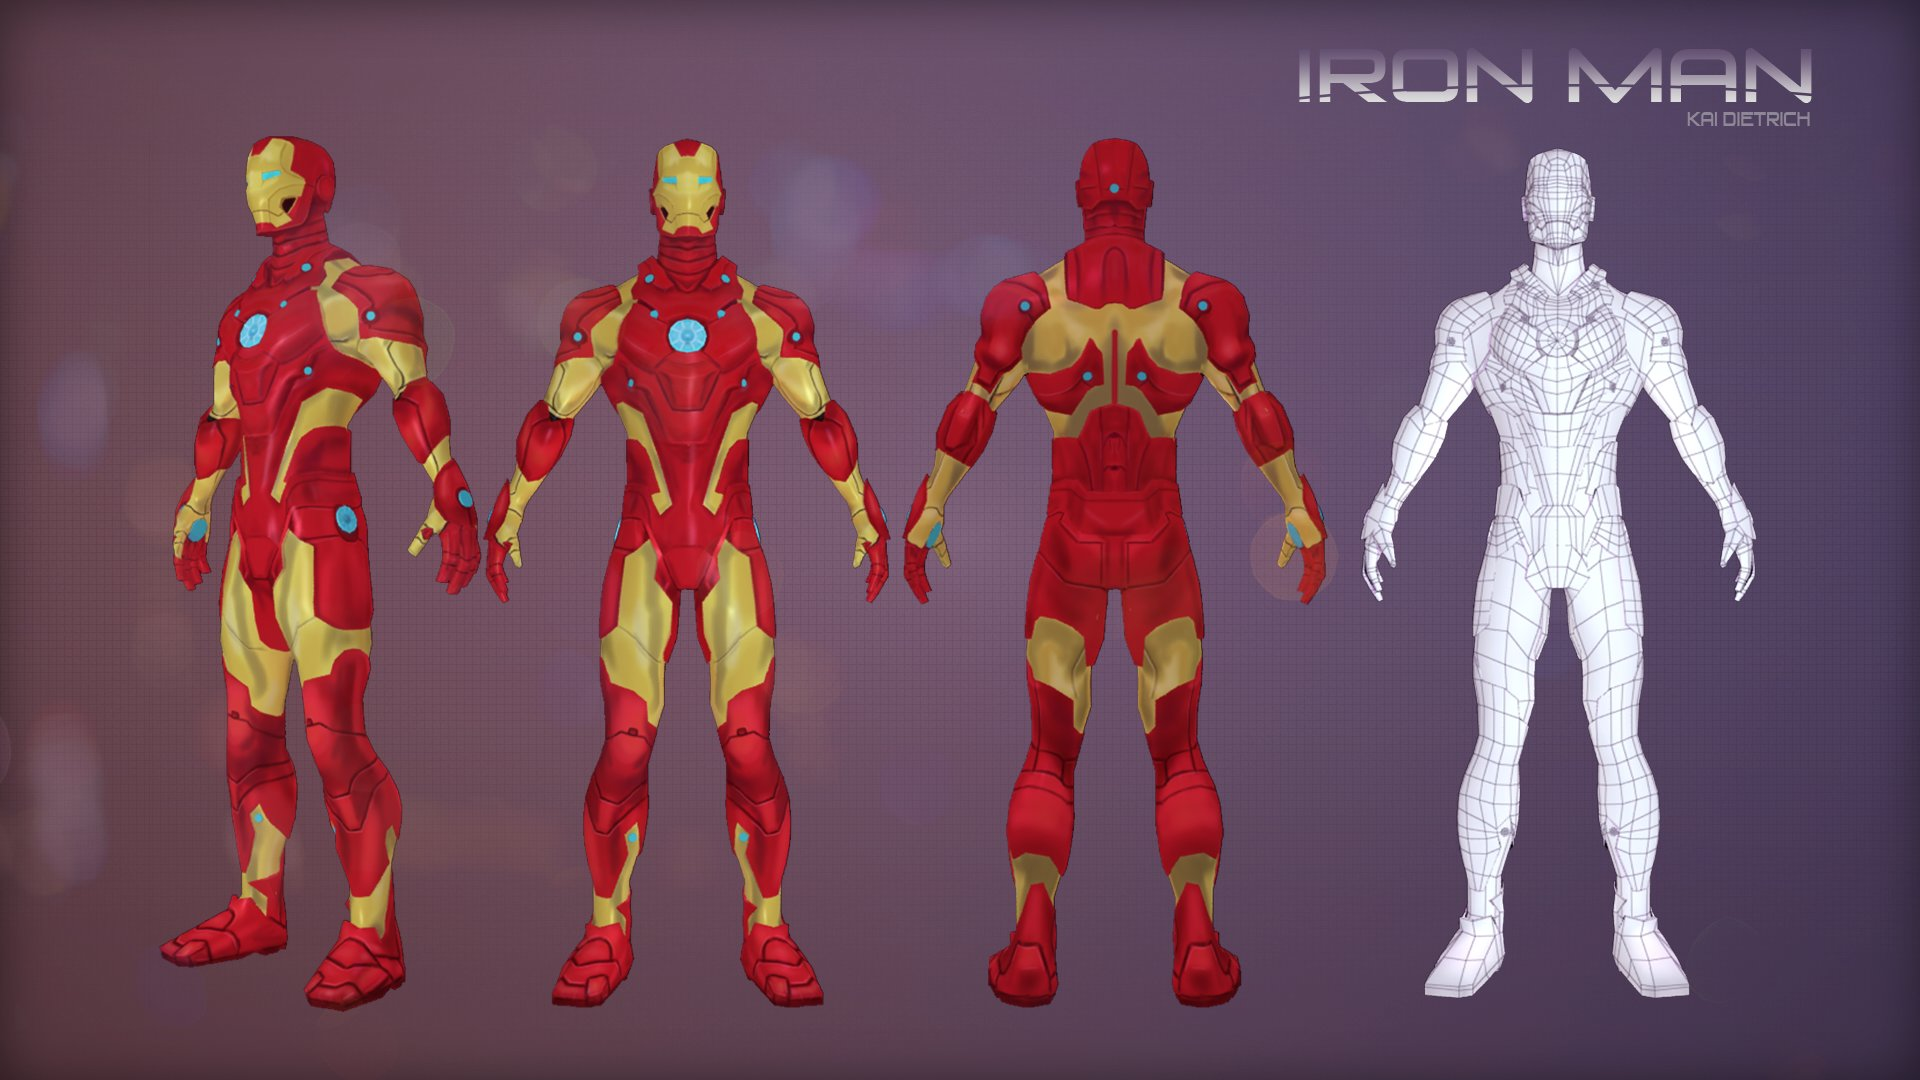 ArtStation - Iron Man, Kai Dietrich